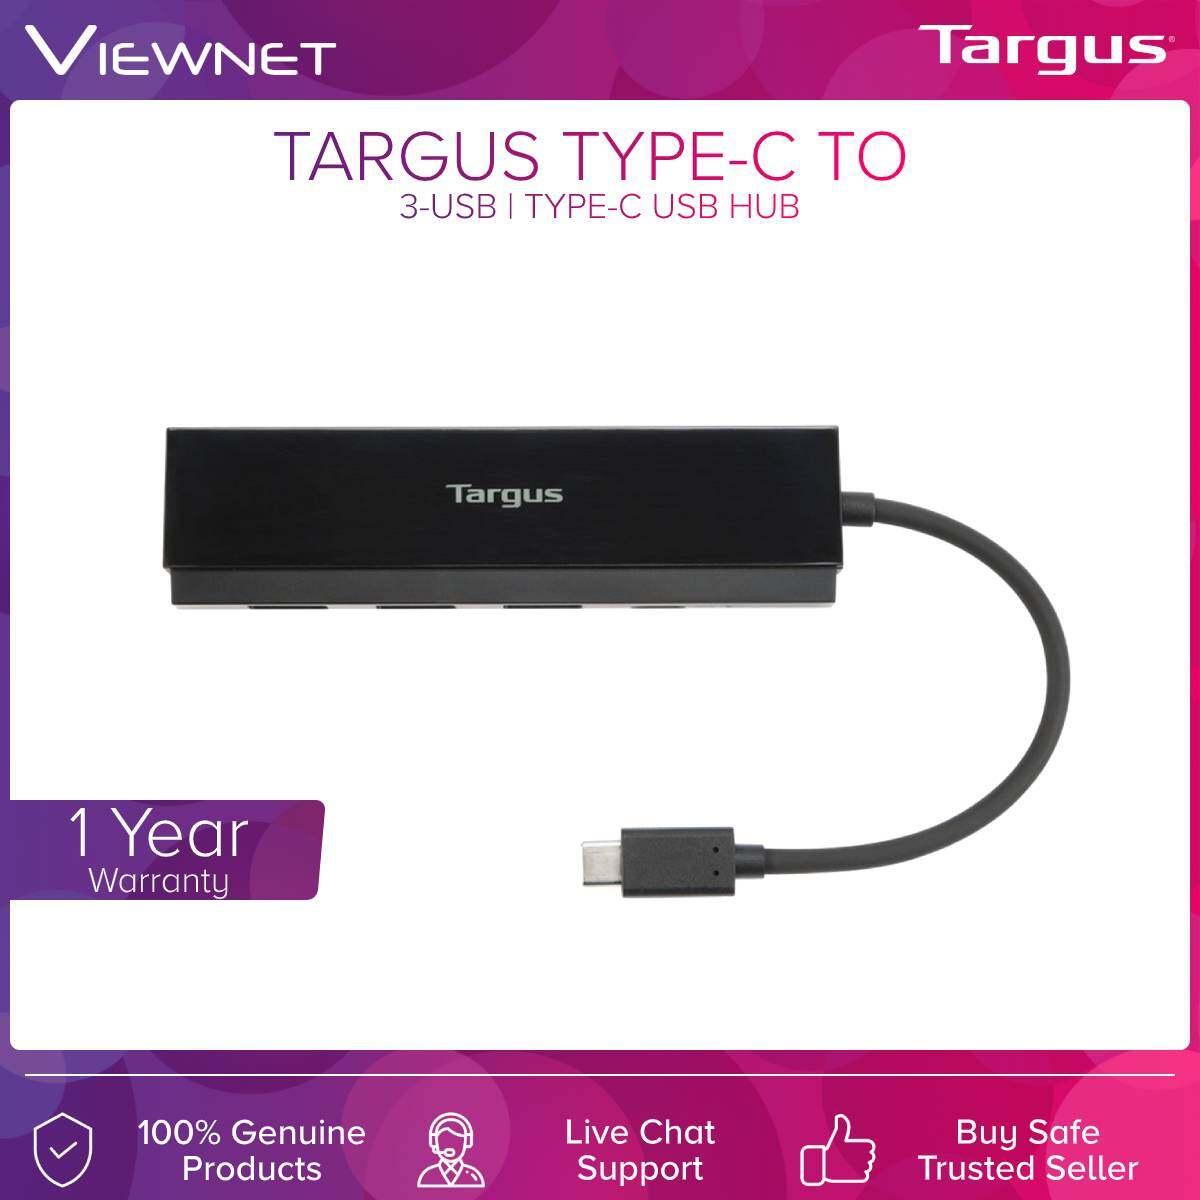 Targus (ACH934AP) Type-c to 3-Usb / Type-c Usb Hub